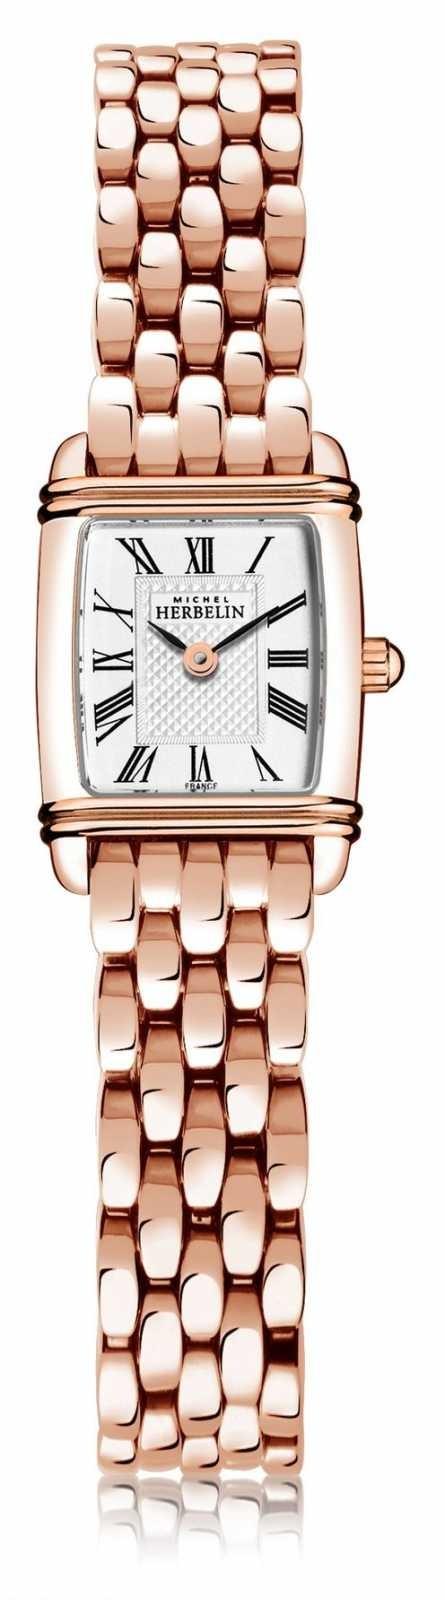 Michel Herbelin Art Déco   Women's Rose Gold Plated Steel Bracelet   White Dial   Roman Numeral  17438/PR08B